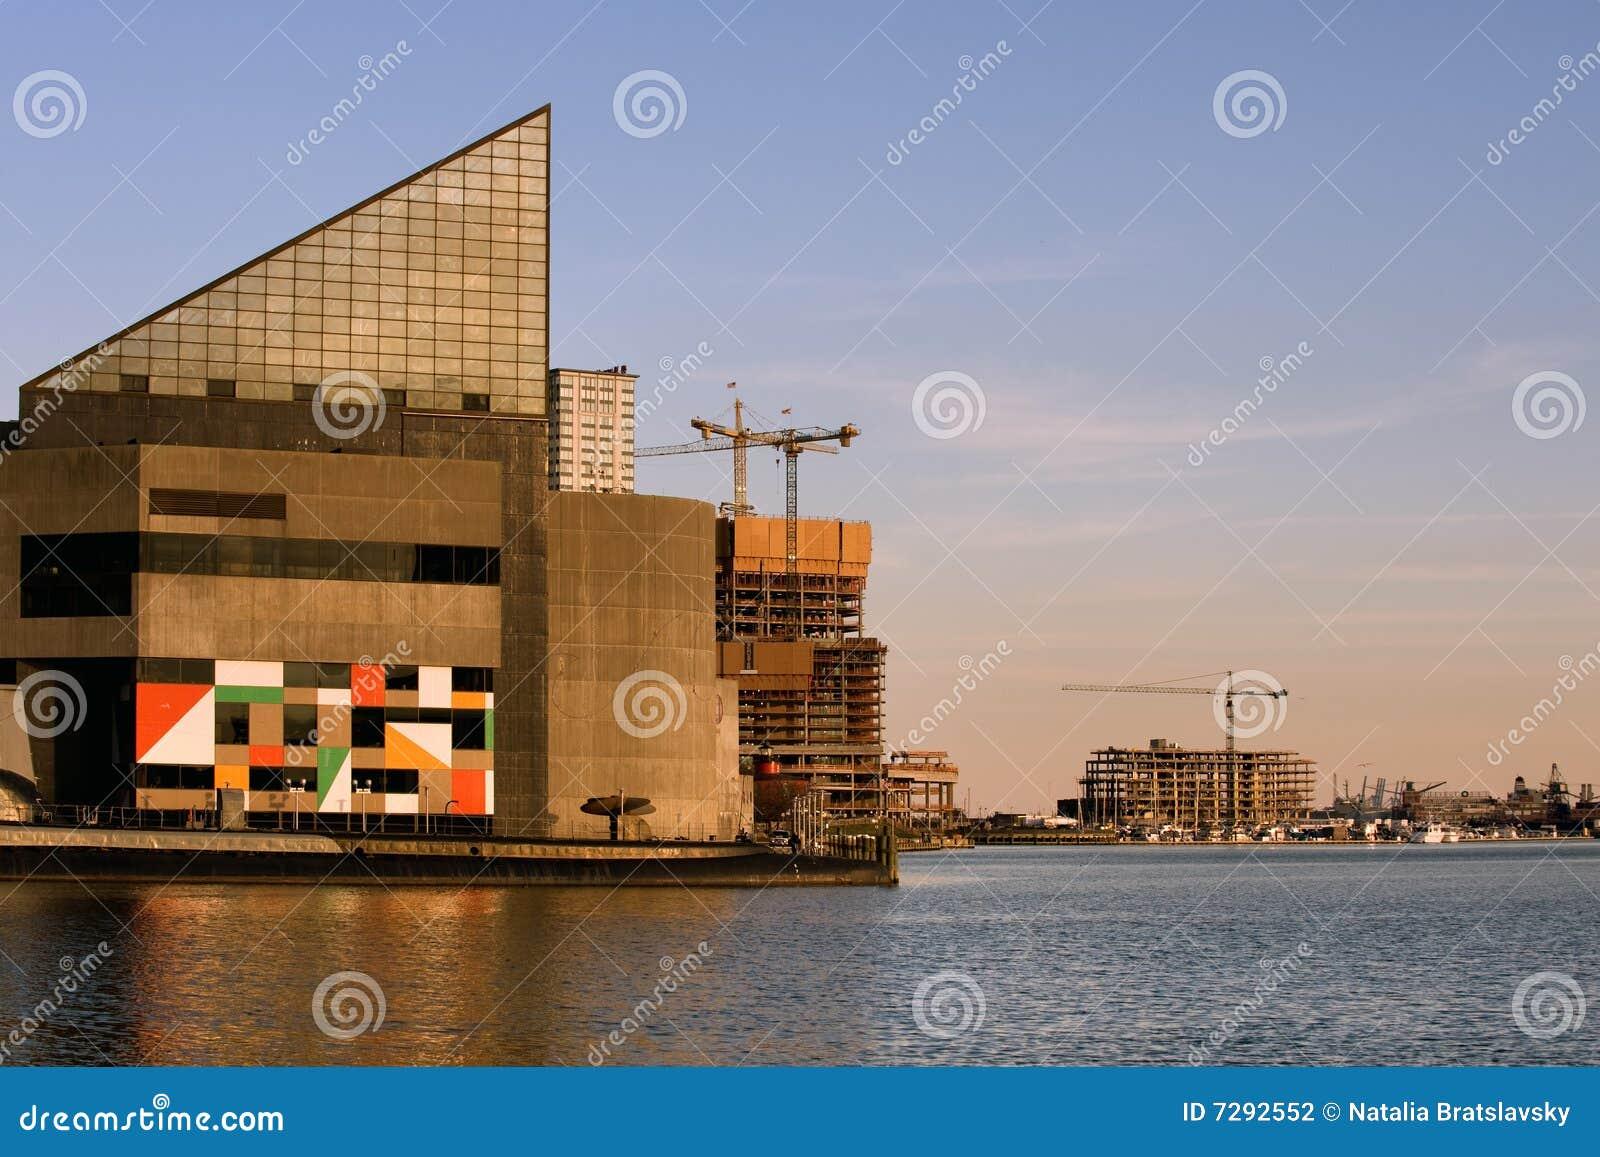 Baltimore Aquarium Stock Photo Image Of Baltimore Marina